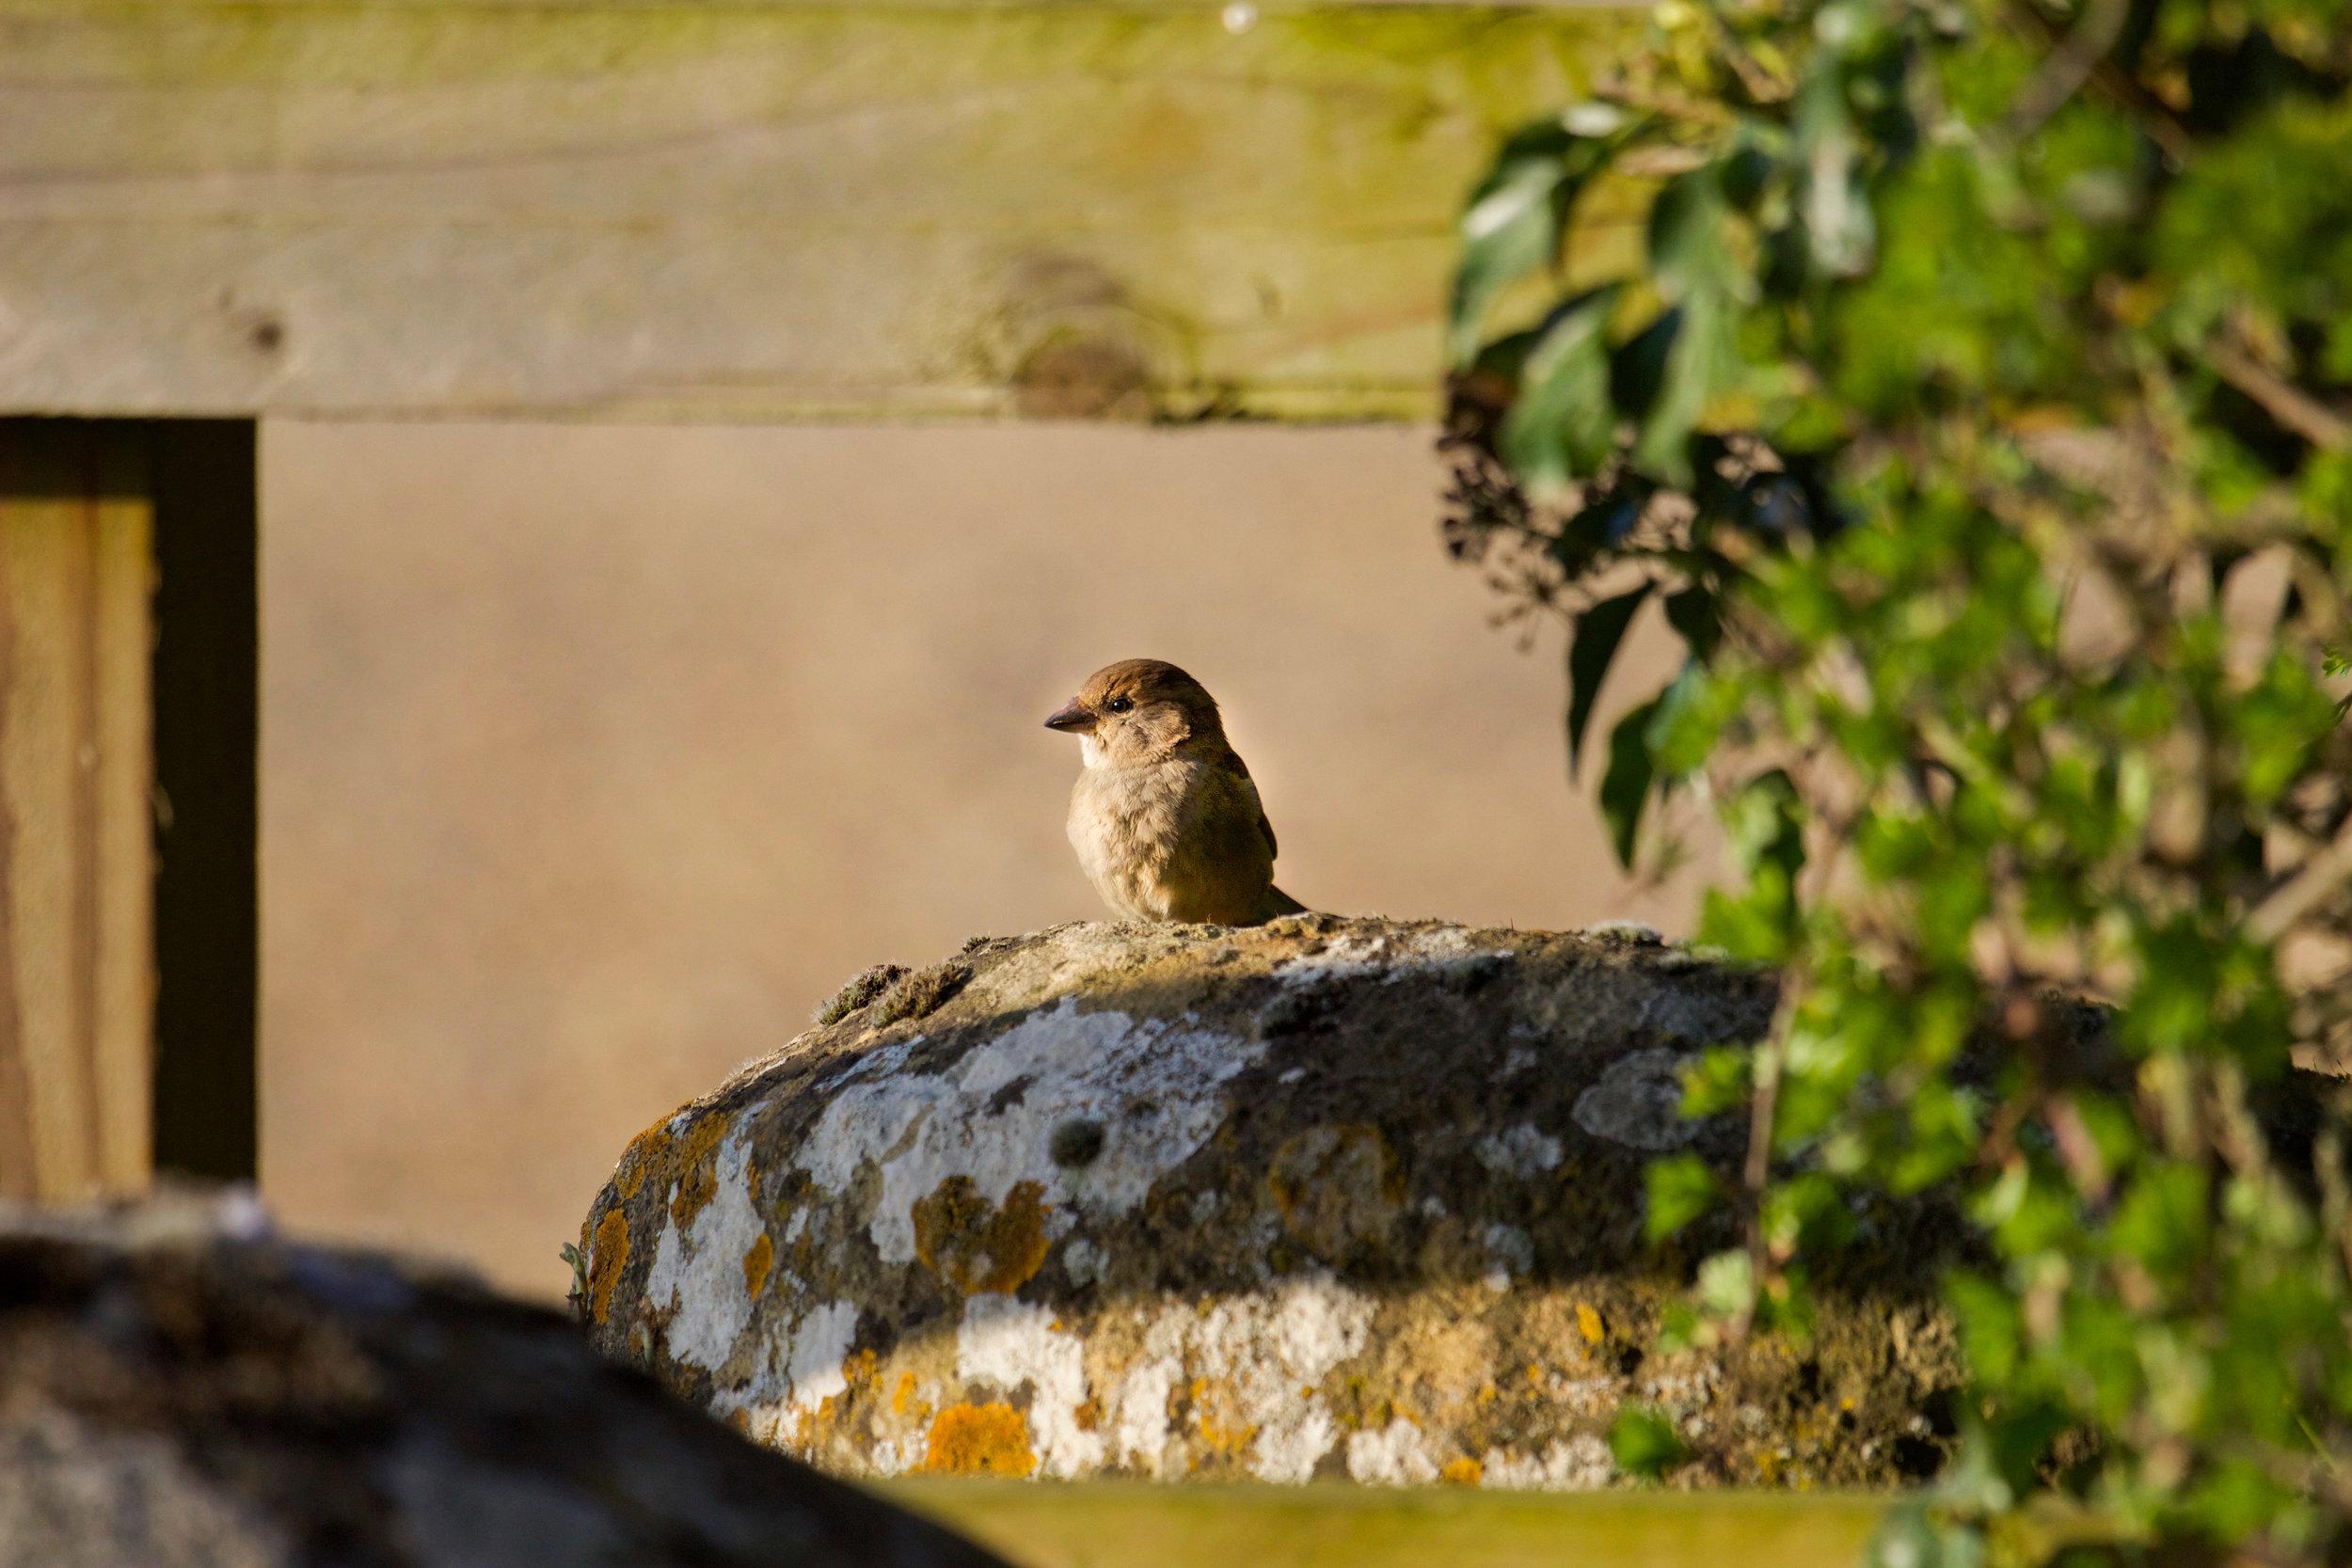 england sparrow on rock daylesford (1 of 1).jpg